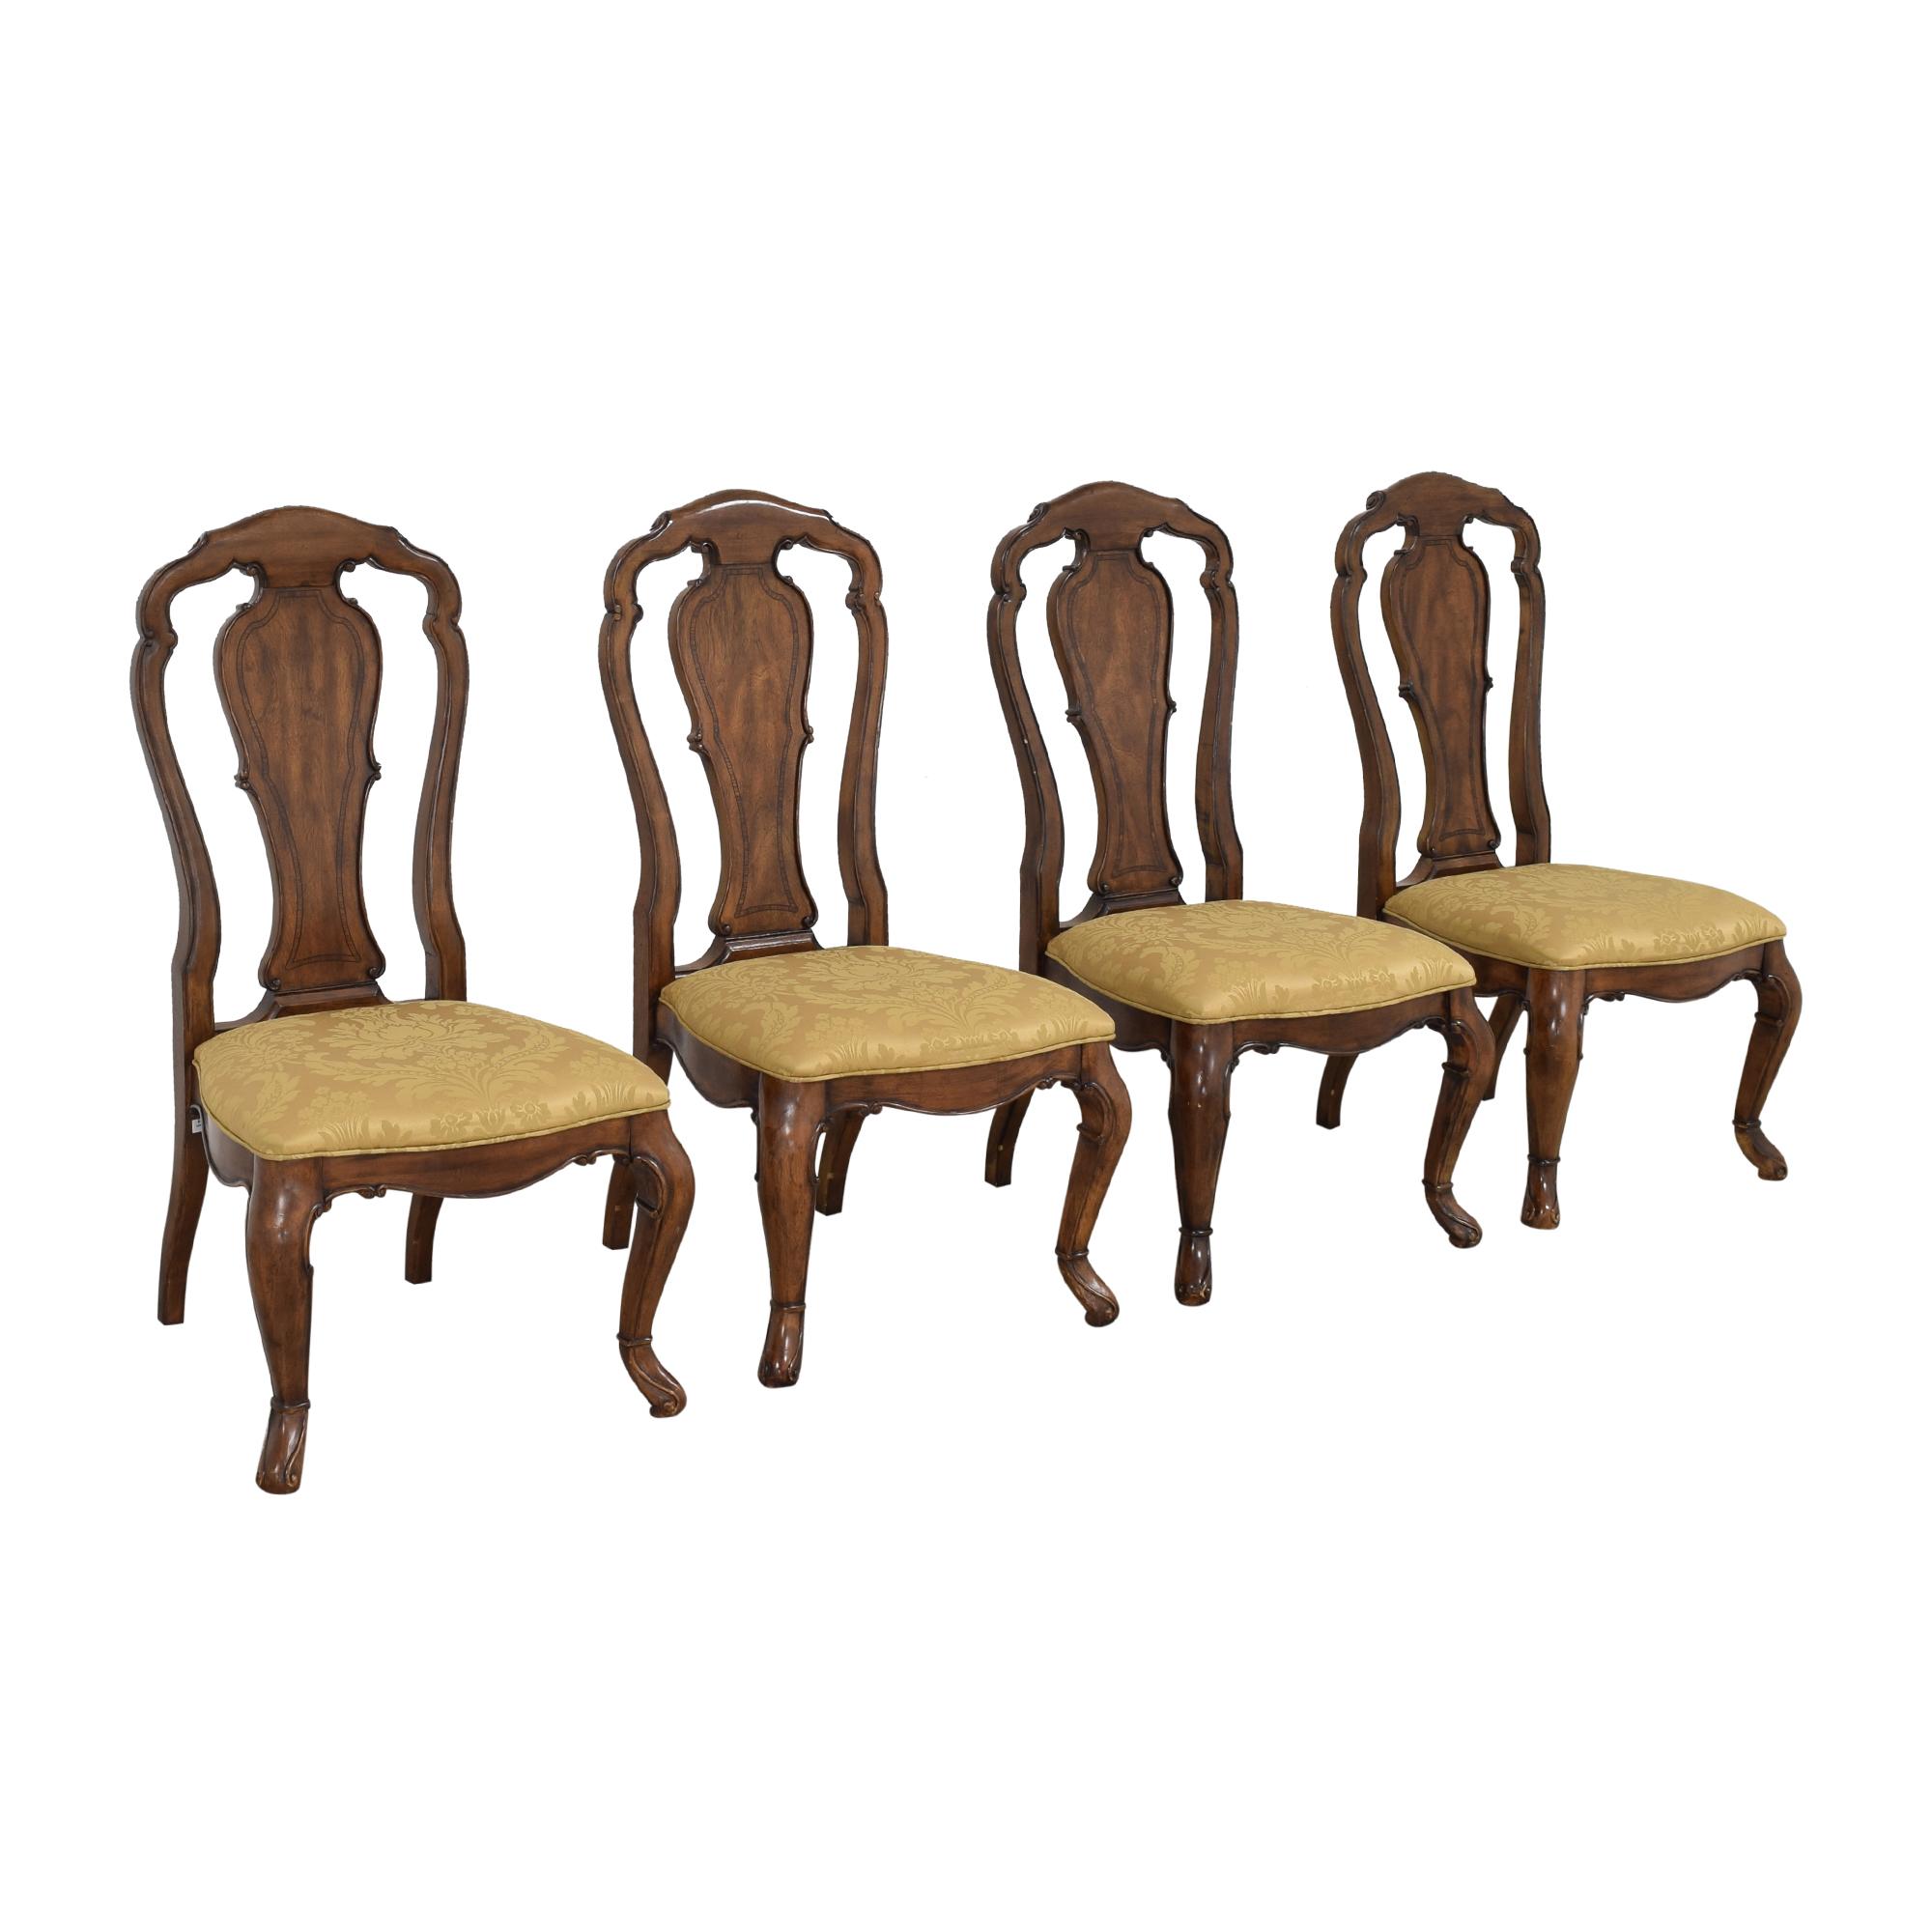 buy Thomasville Ernest Hemingway Granada Dining Chairs Thomasville Dining Chairs